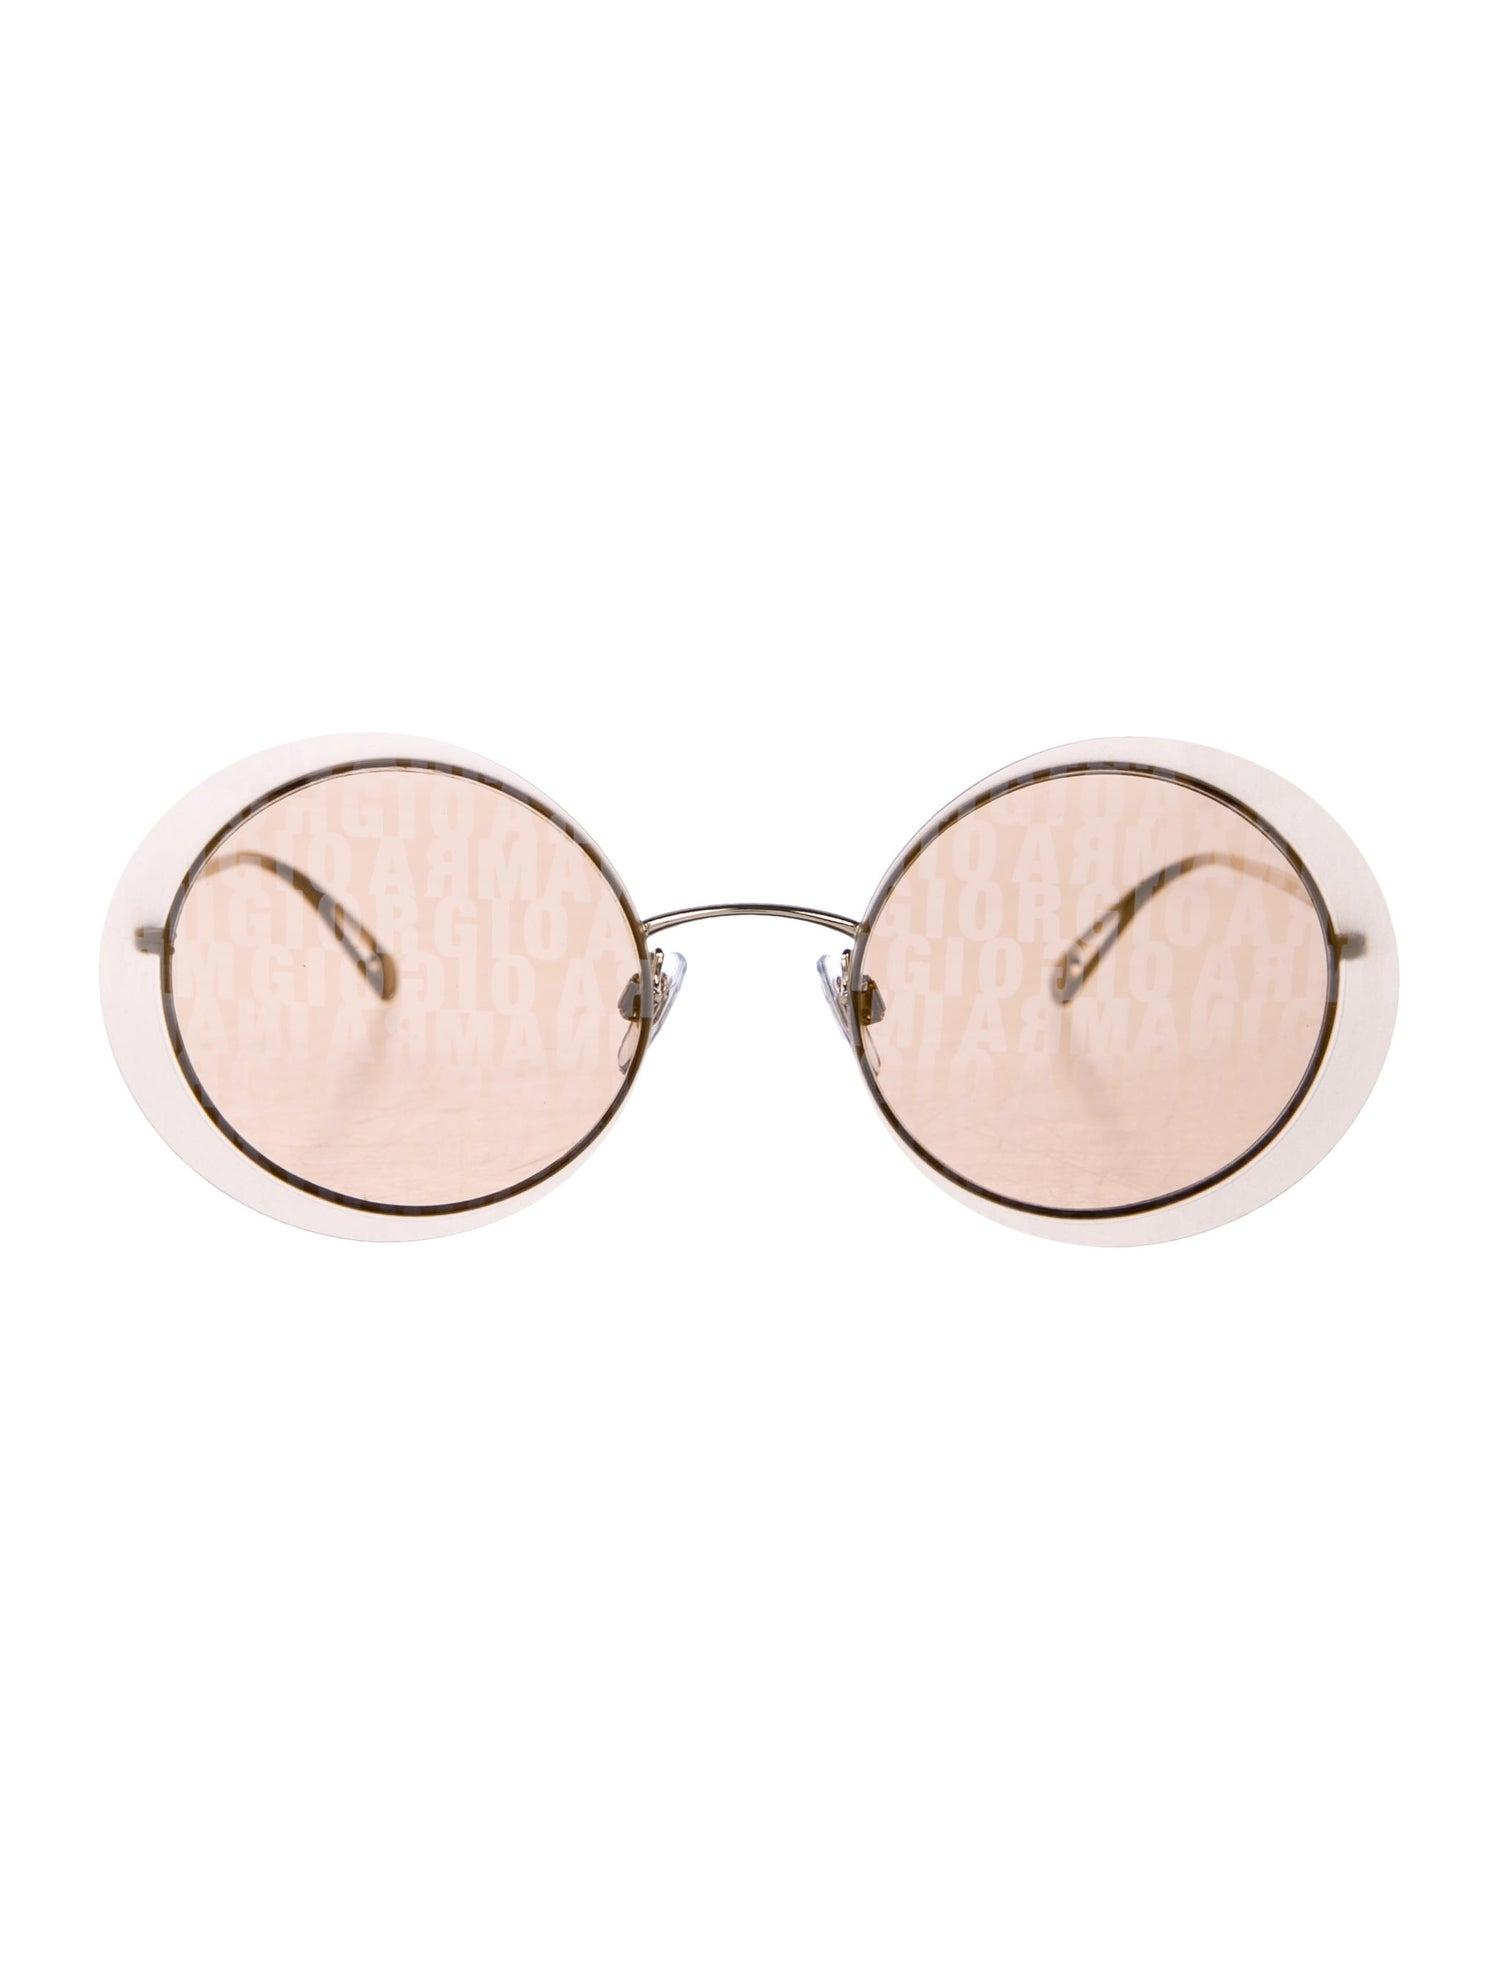 Round Logo Sunglasses w/ Tags - Giorgio Armani, $145